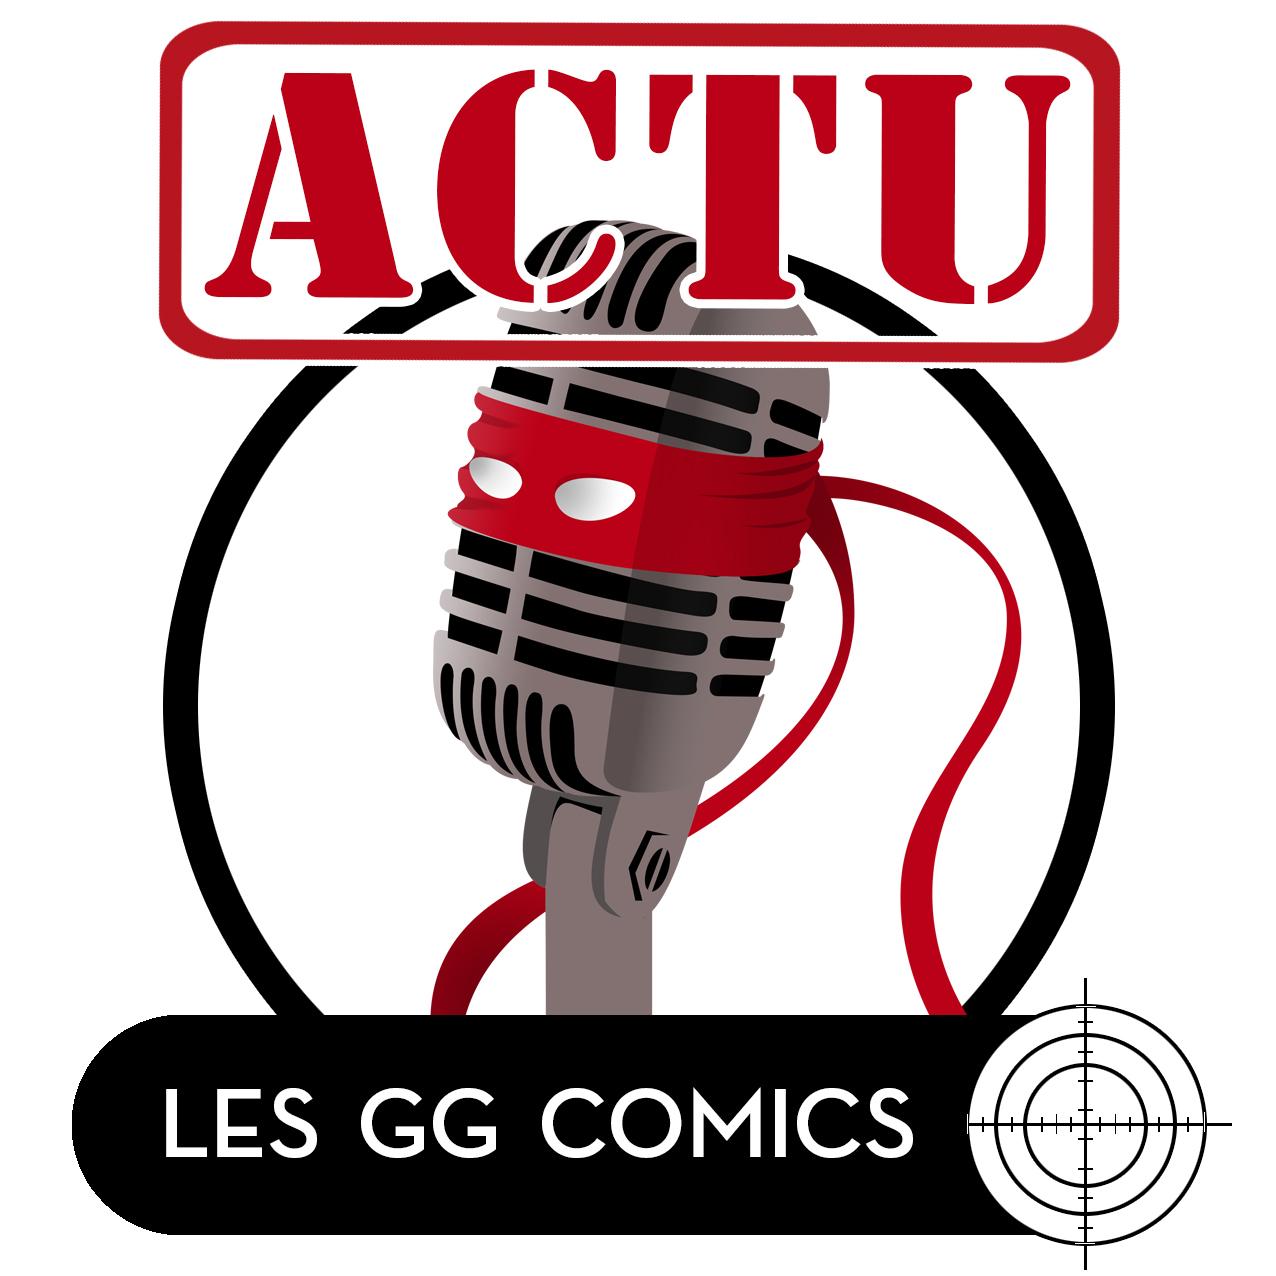 Les GG comics Actu #3 : Infinity Softcovers !